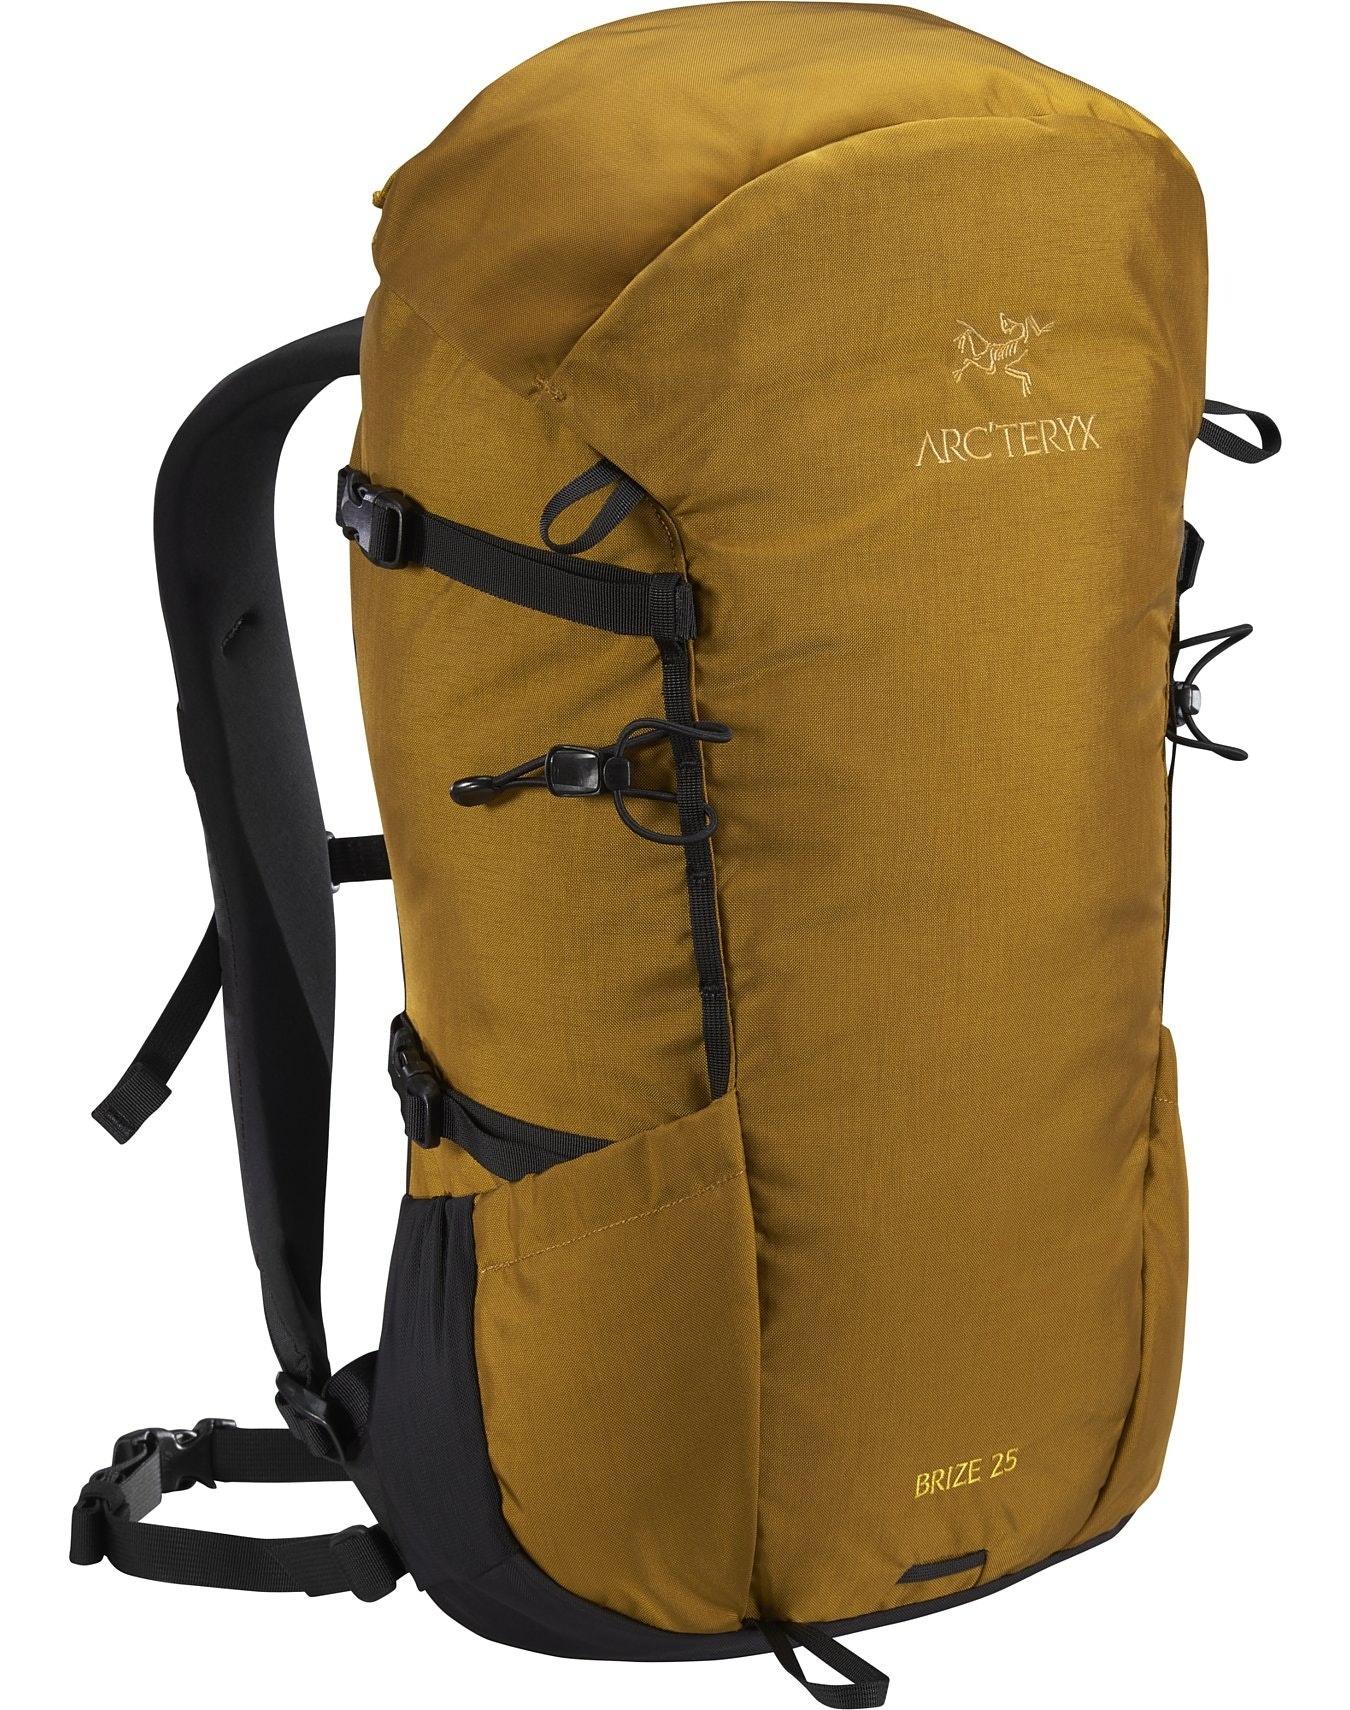 Arcteryx Arc'teryx F19 Brize 25 Backpack